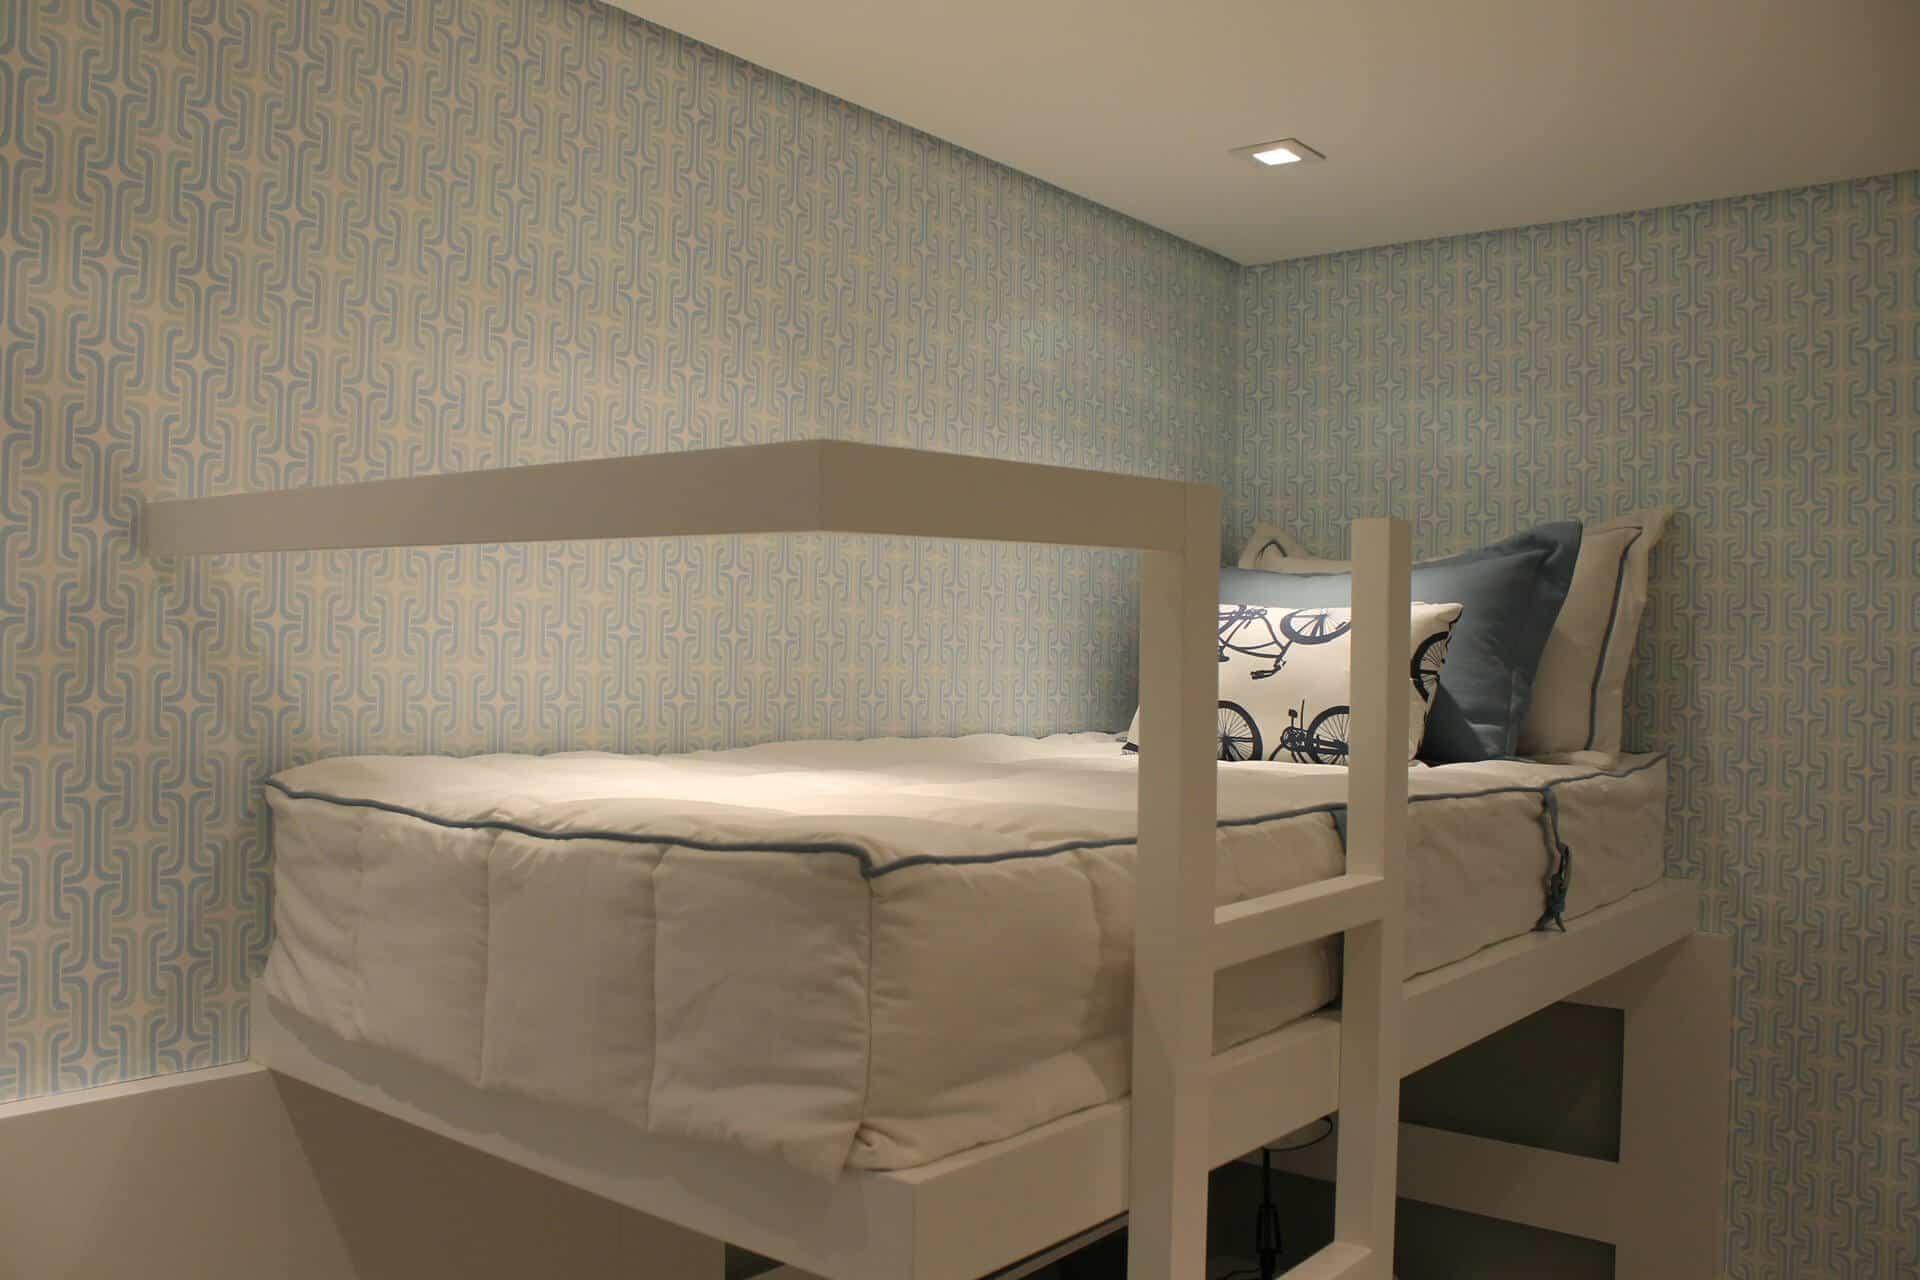 dormitorio-planejado_moveis-sob-medida-galeria-55